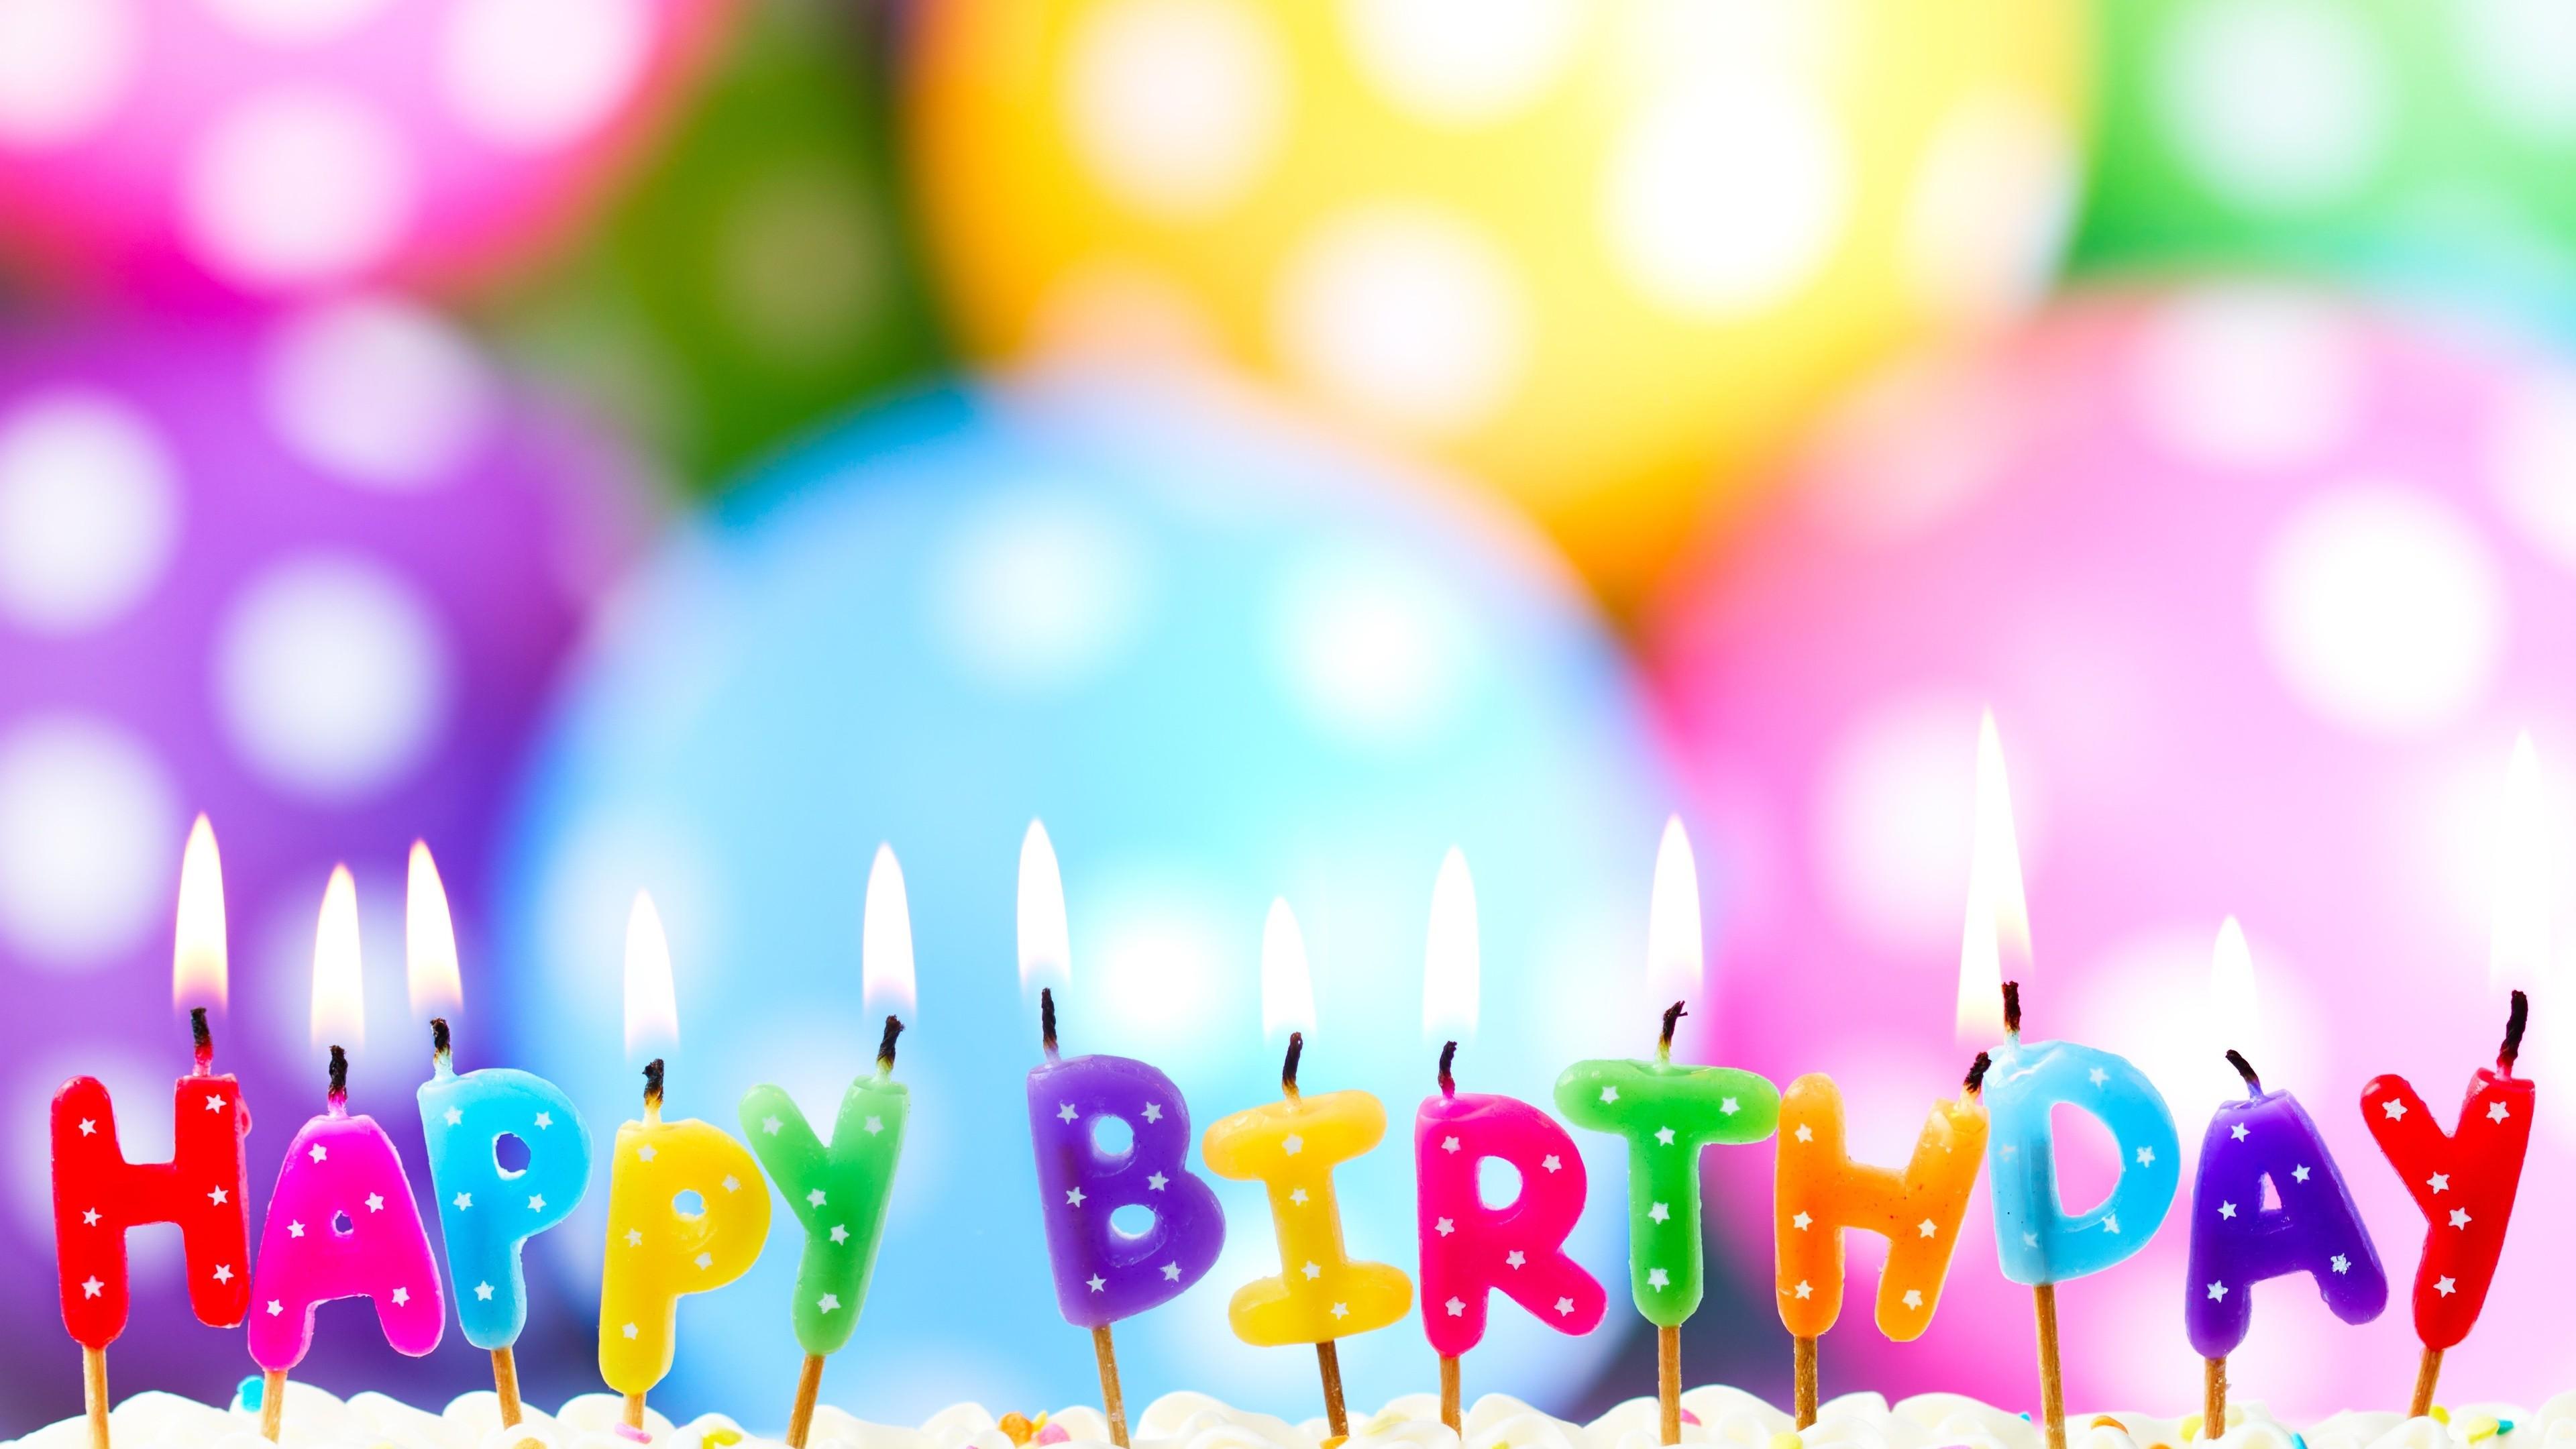 Simple Wallpaper Name Happy Birthday - 282527  Snapshot_676867.jpg